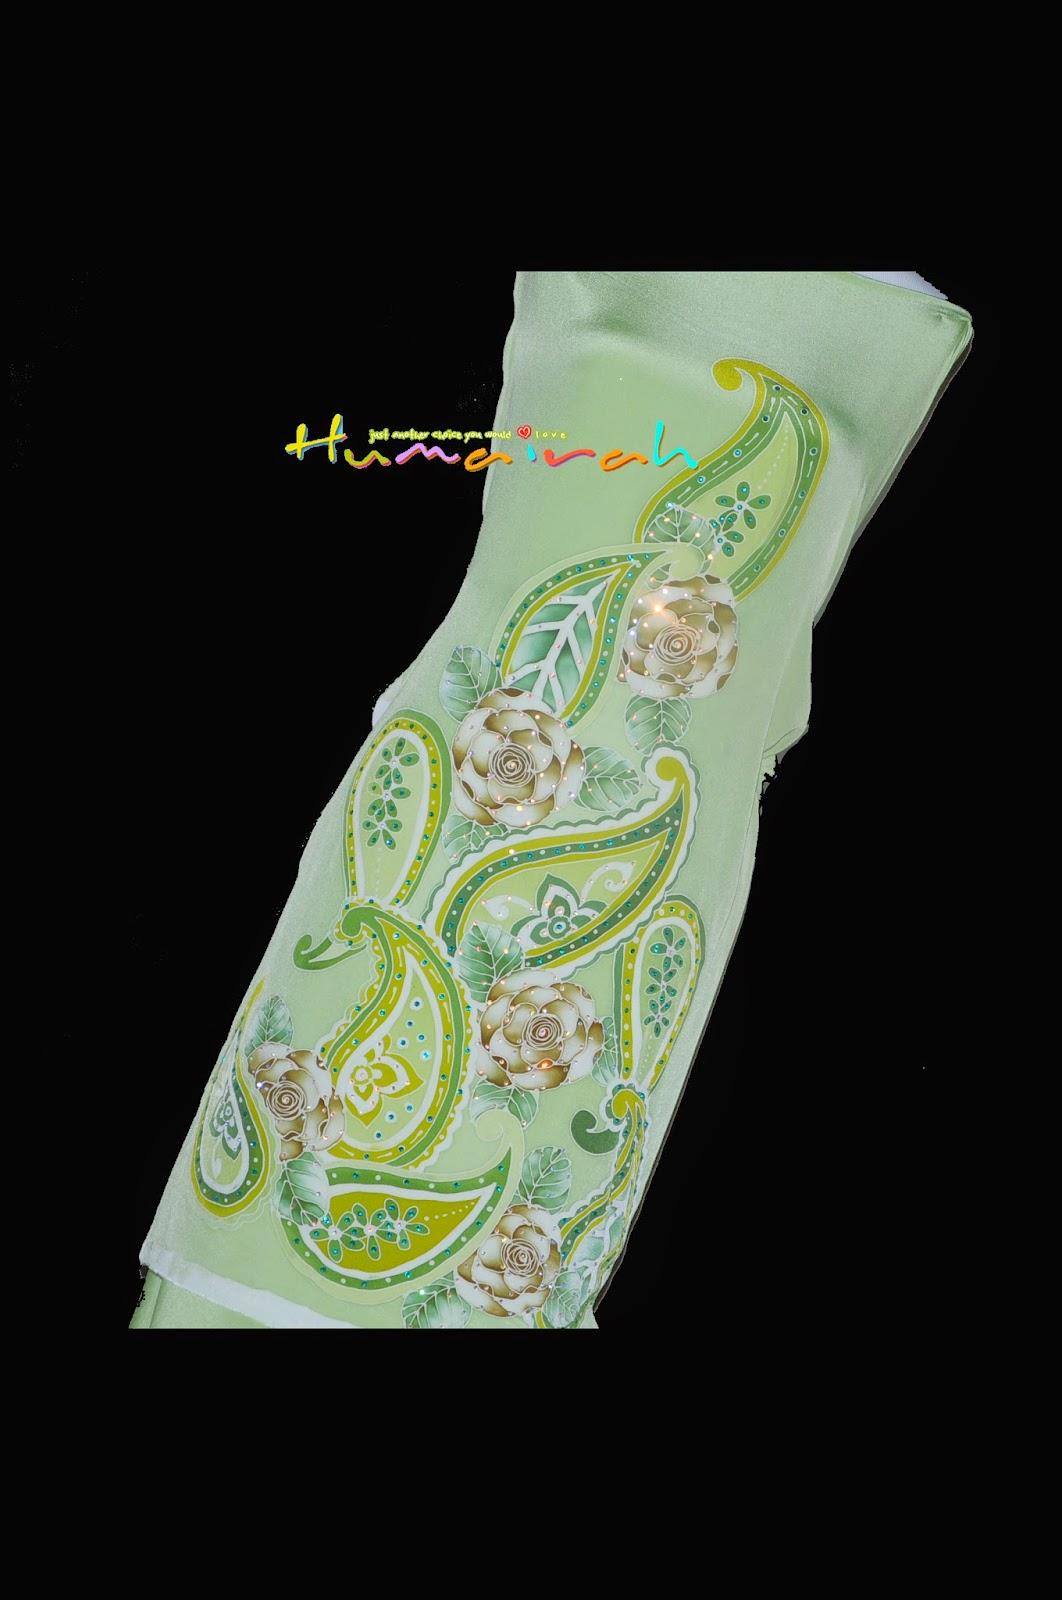 CX82 Batik Sutera Exclusive - Green Paisley Siap Batu Handmade 6